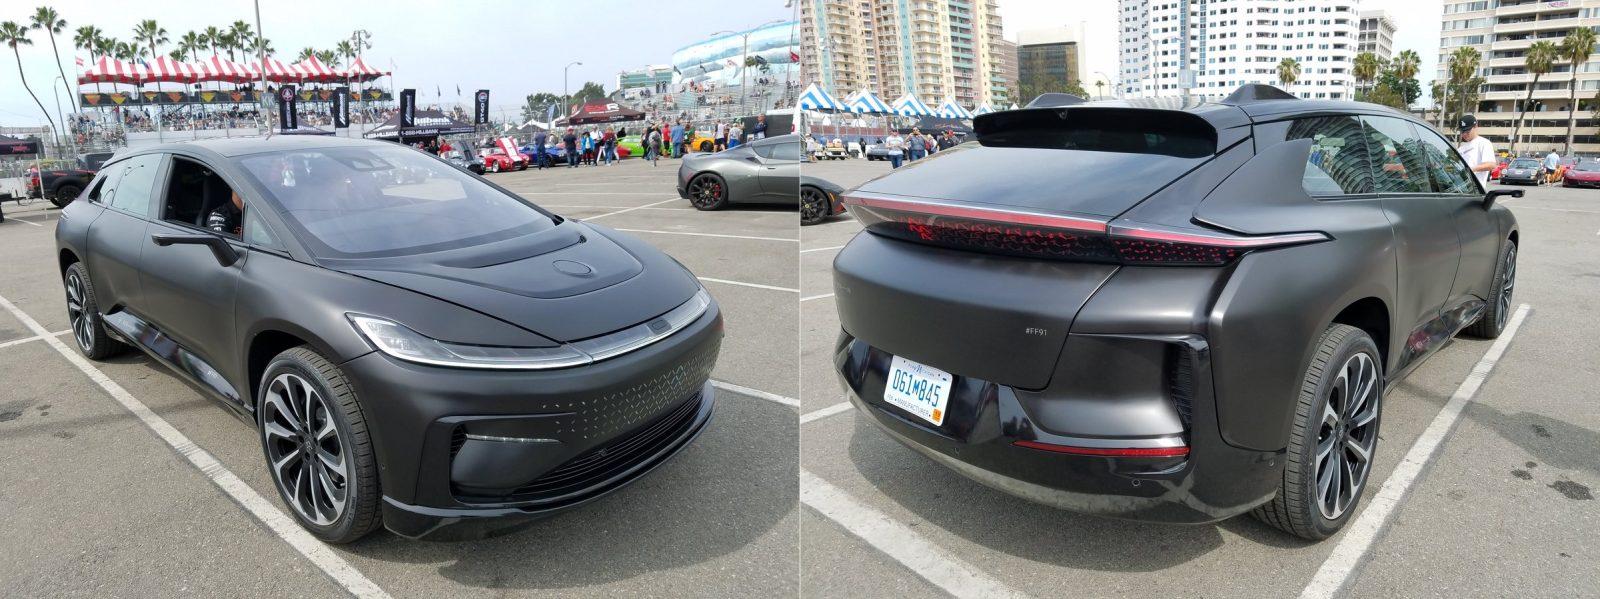 Electric Car Startup Faraday Future Gets 225 Million Bridge Loan But To Where